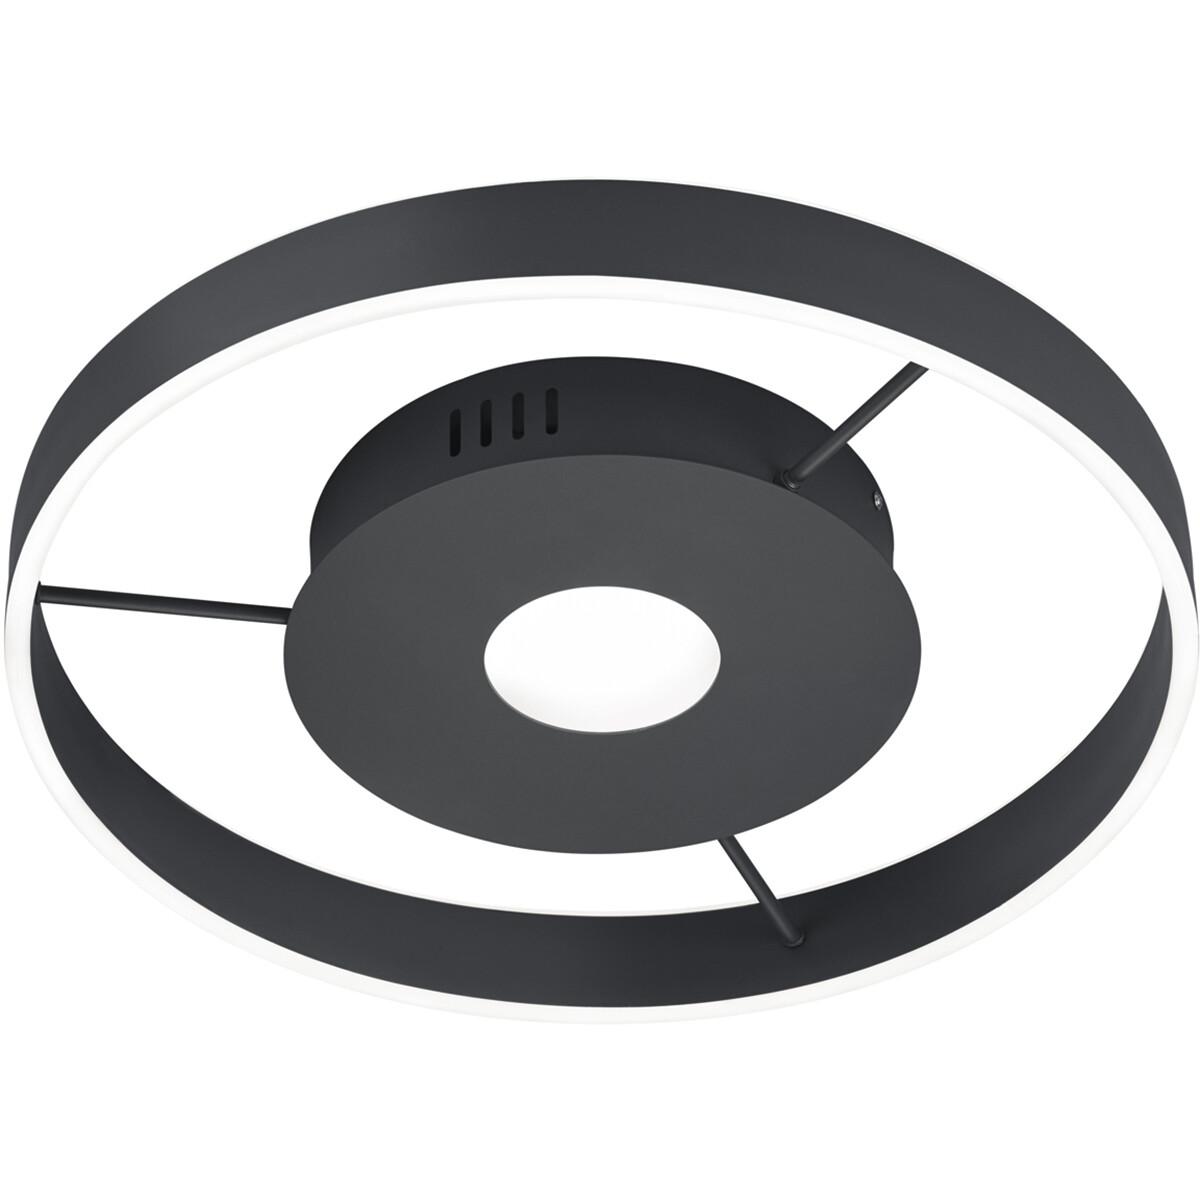 LED Plafondlamp - Plafondverlichting - Trion Lonag - 45W - Aanpasbare Kleur - Rond - Mat Zwart - Alu